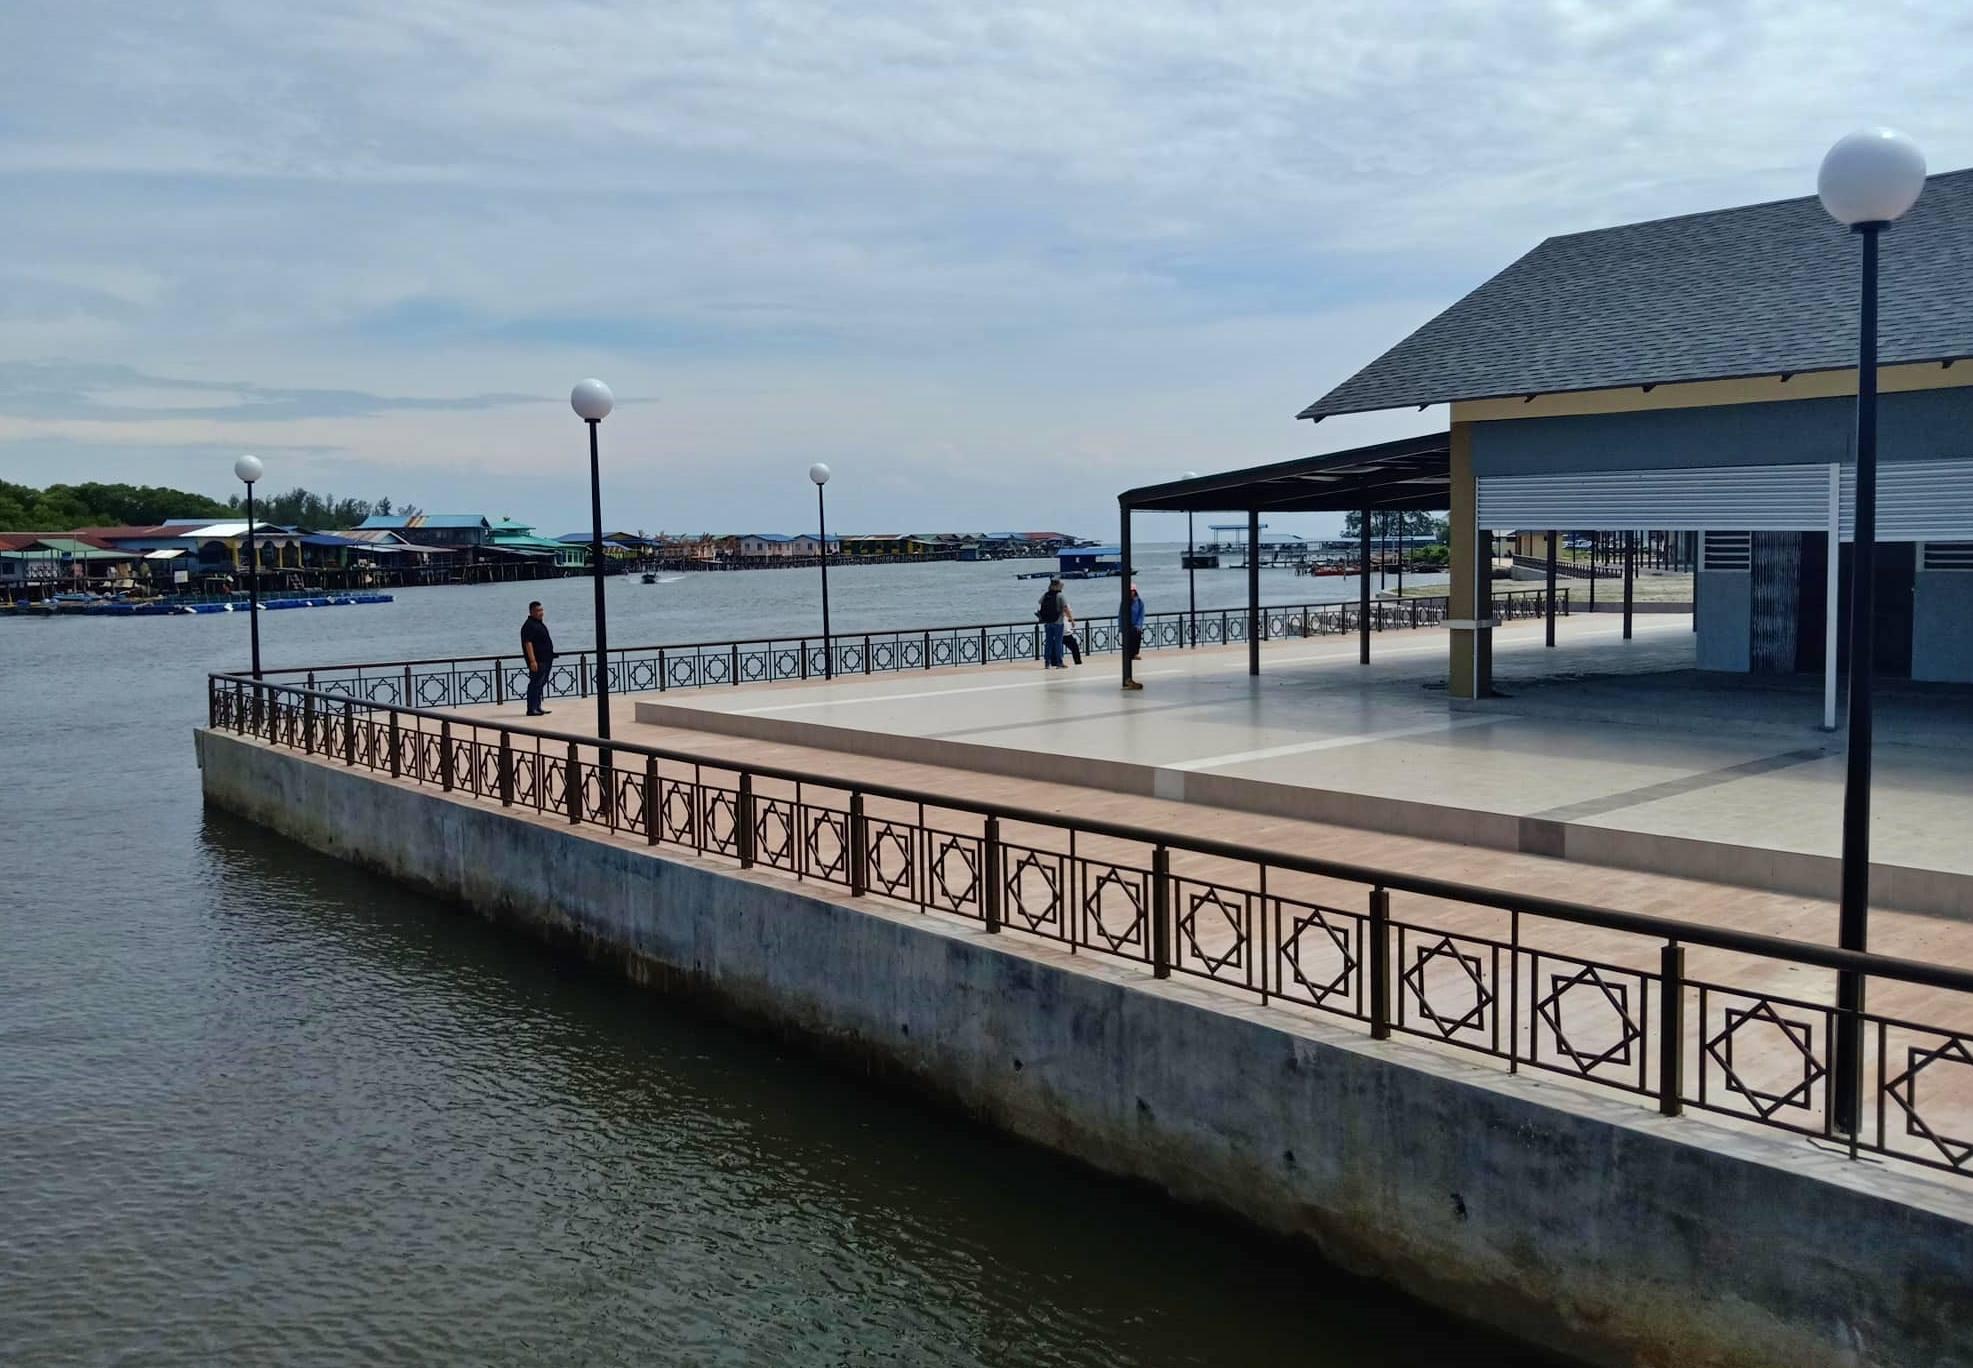 Sarawak, Malaysia, Borneo, destination, fishing village, water village, floating house, Kampung Melayu, Tourism, traditional, transborder, travel guide, 砂拉越婆罗洲, 旅游景点,